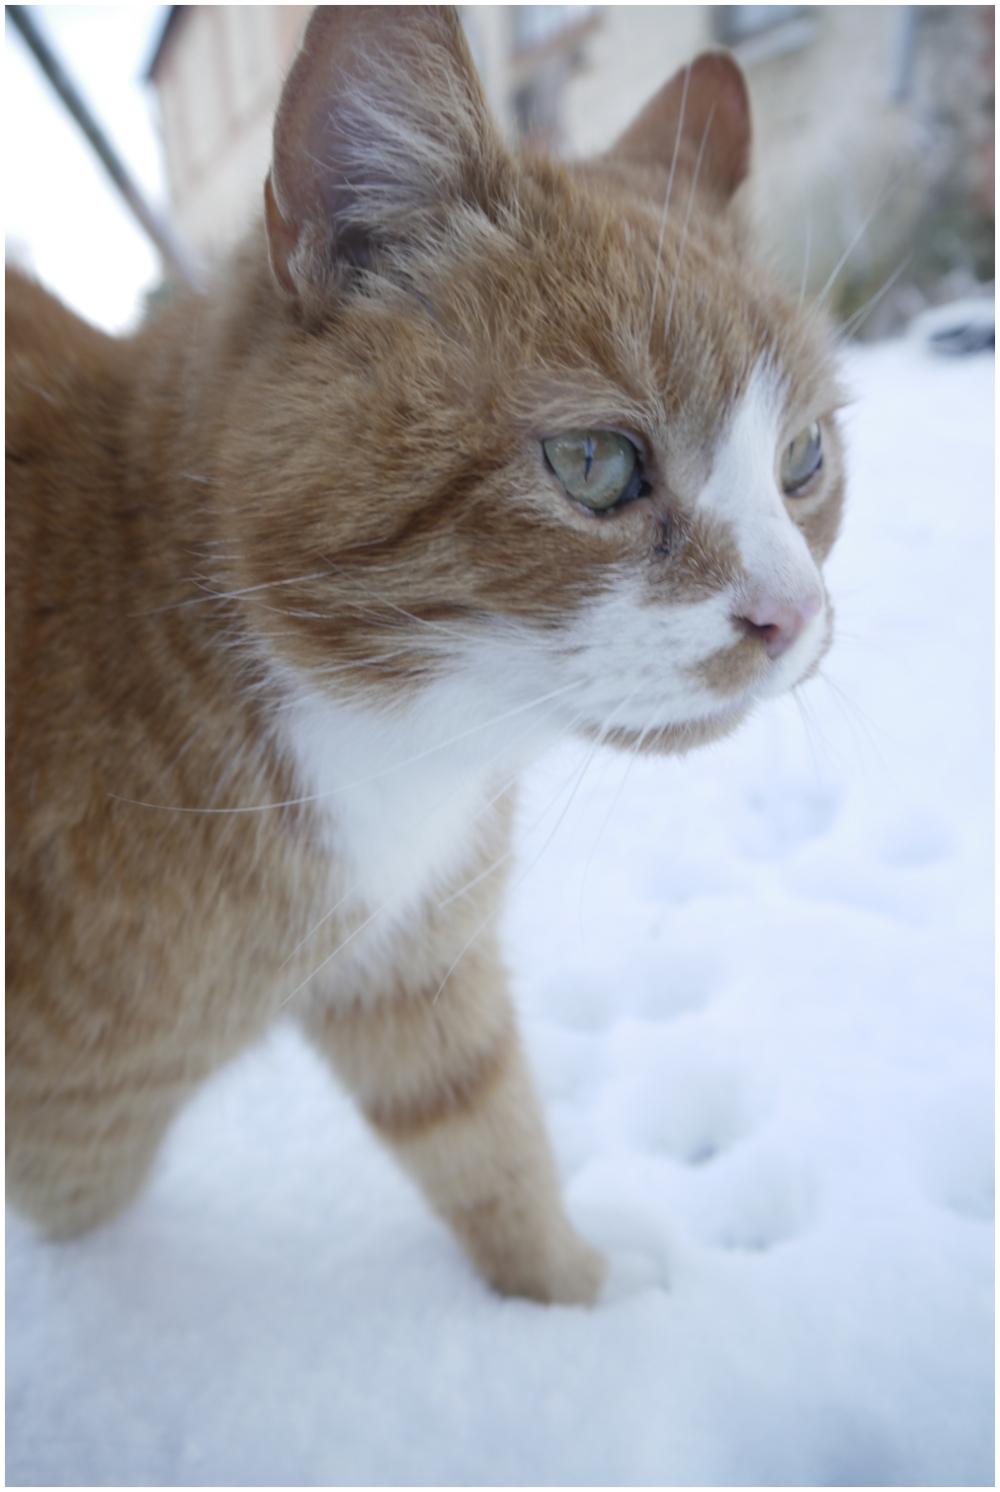 does elvis like snow?